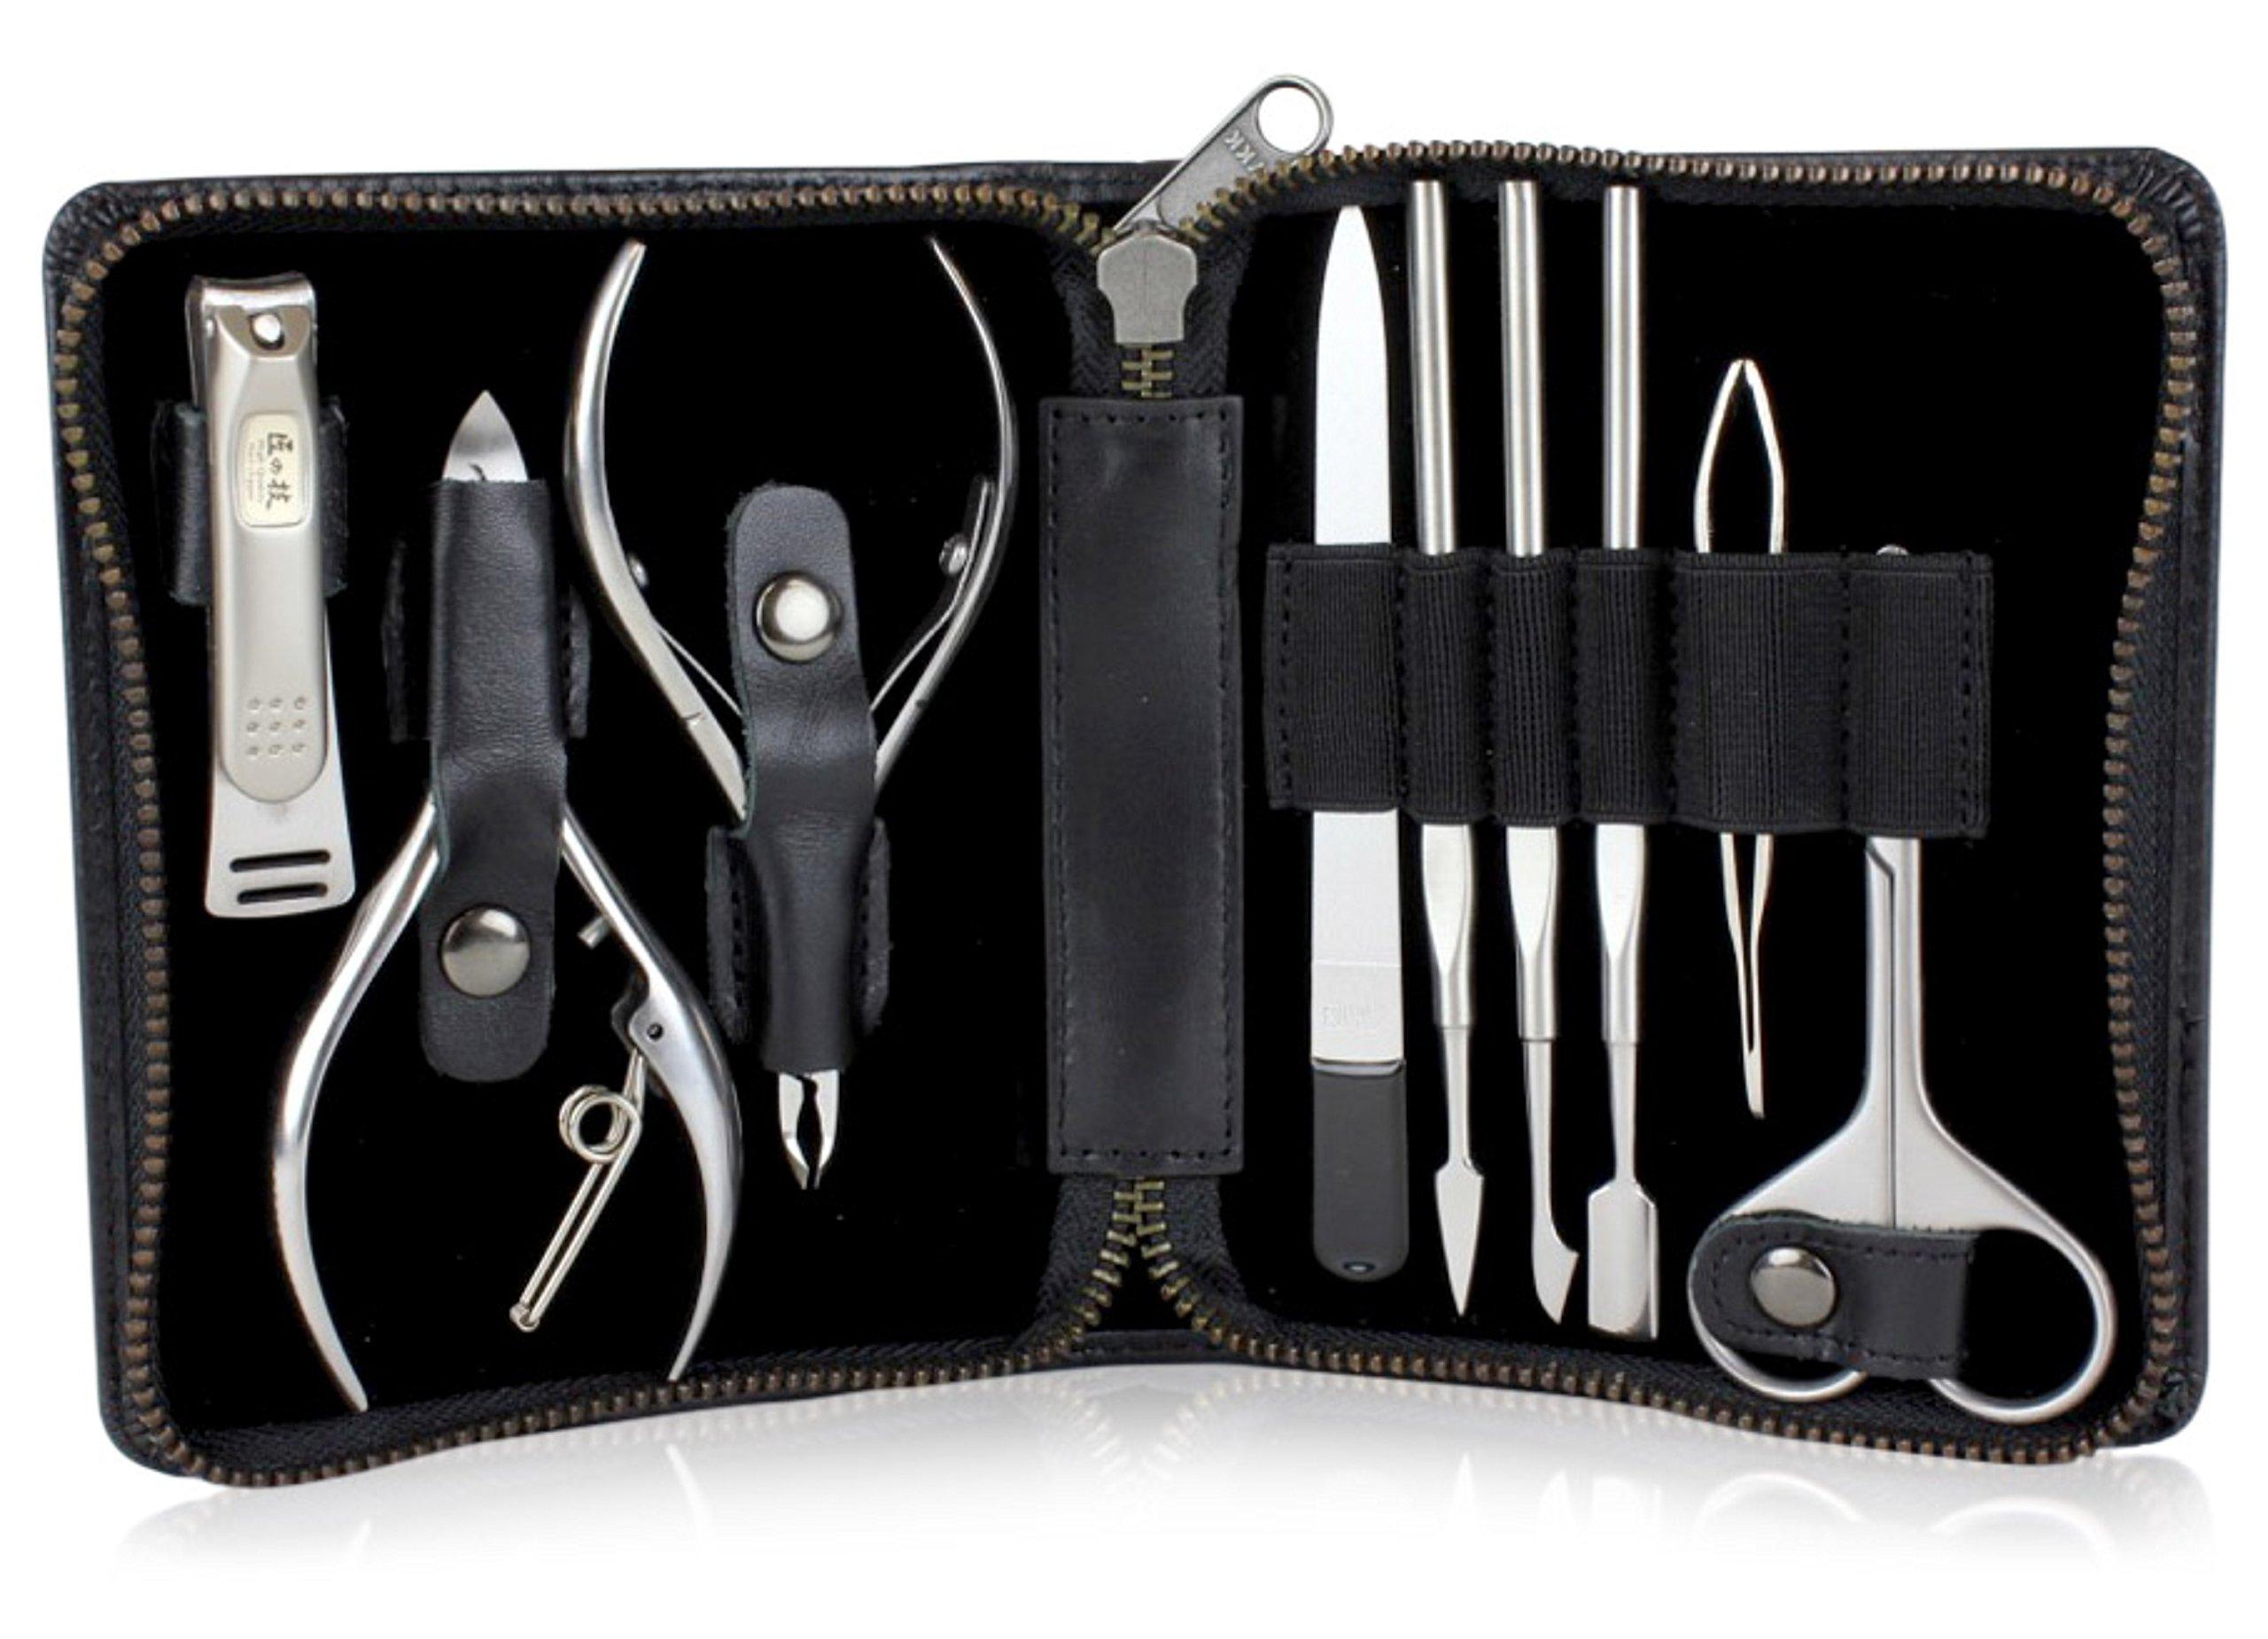 Takumi No Waza G-3104 - Craftsman Luxury 9-Piece Grooming Kit